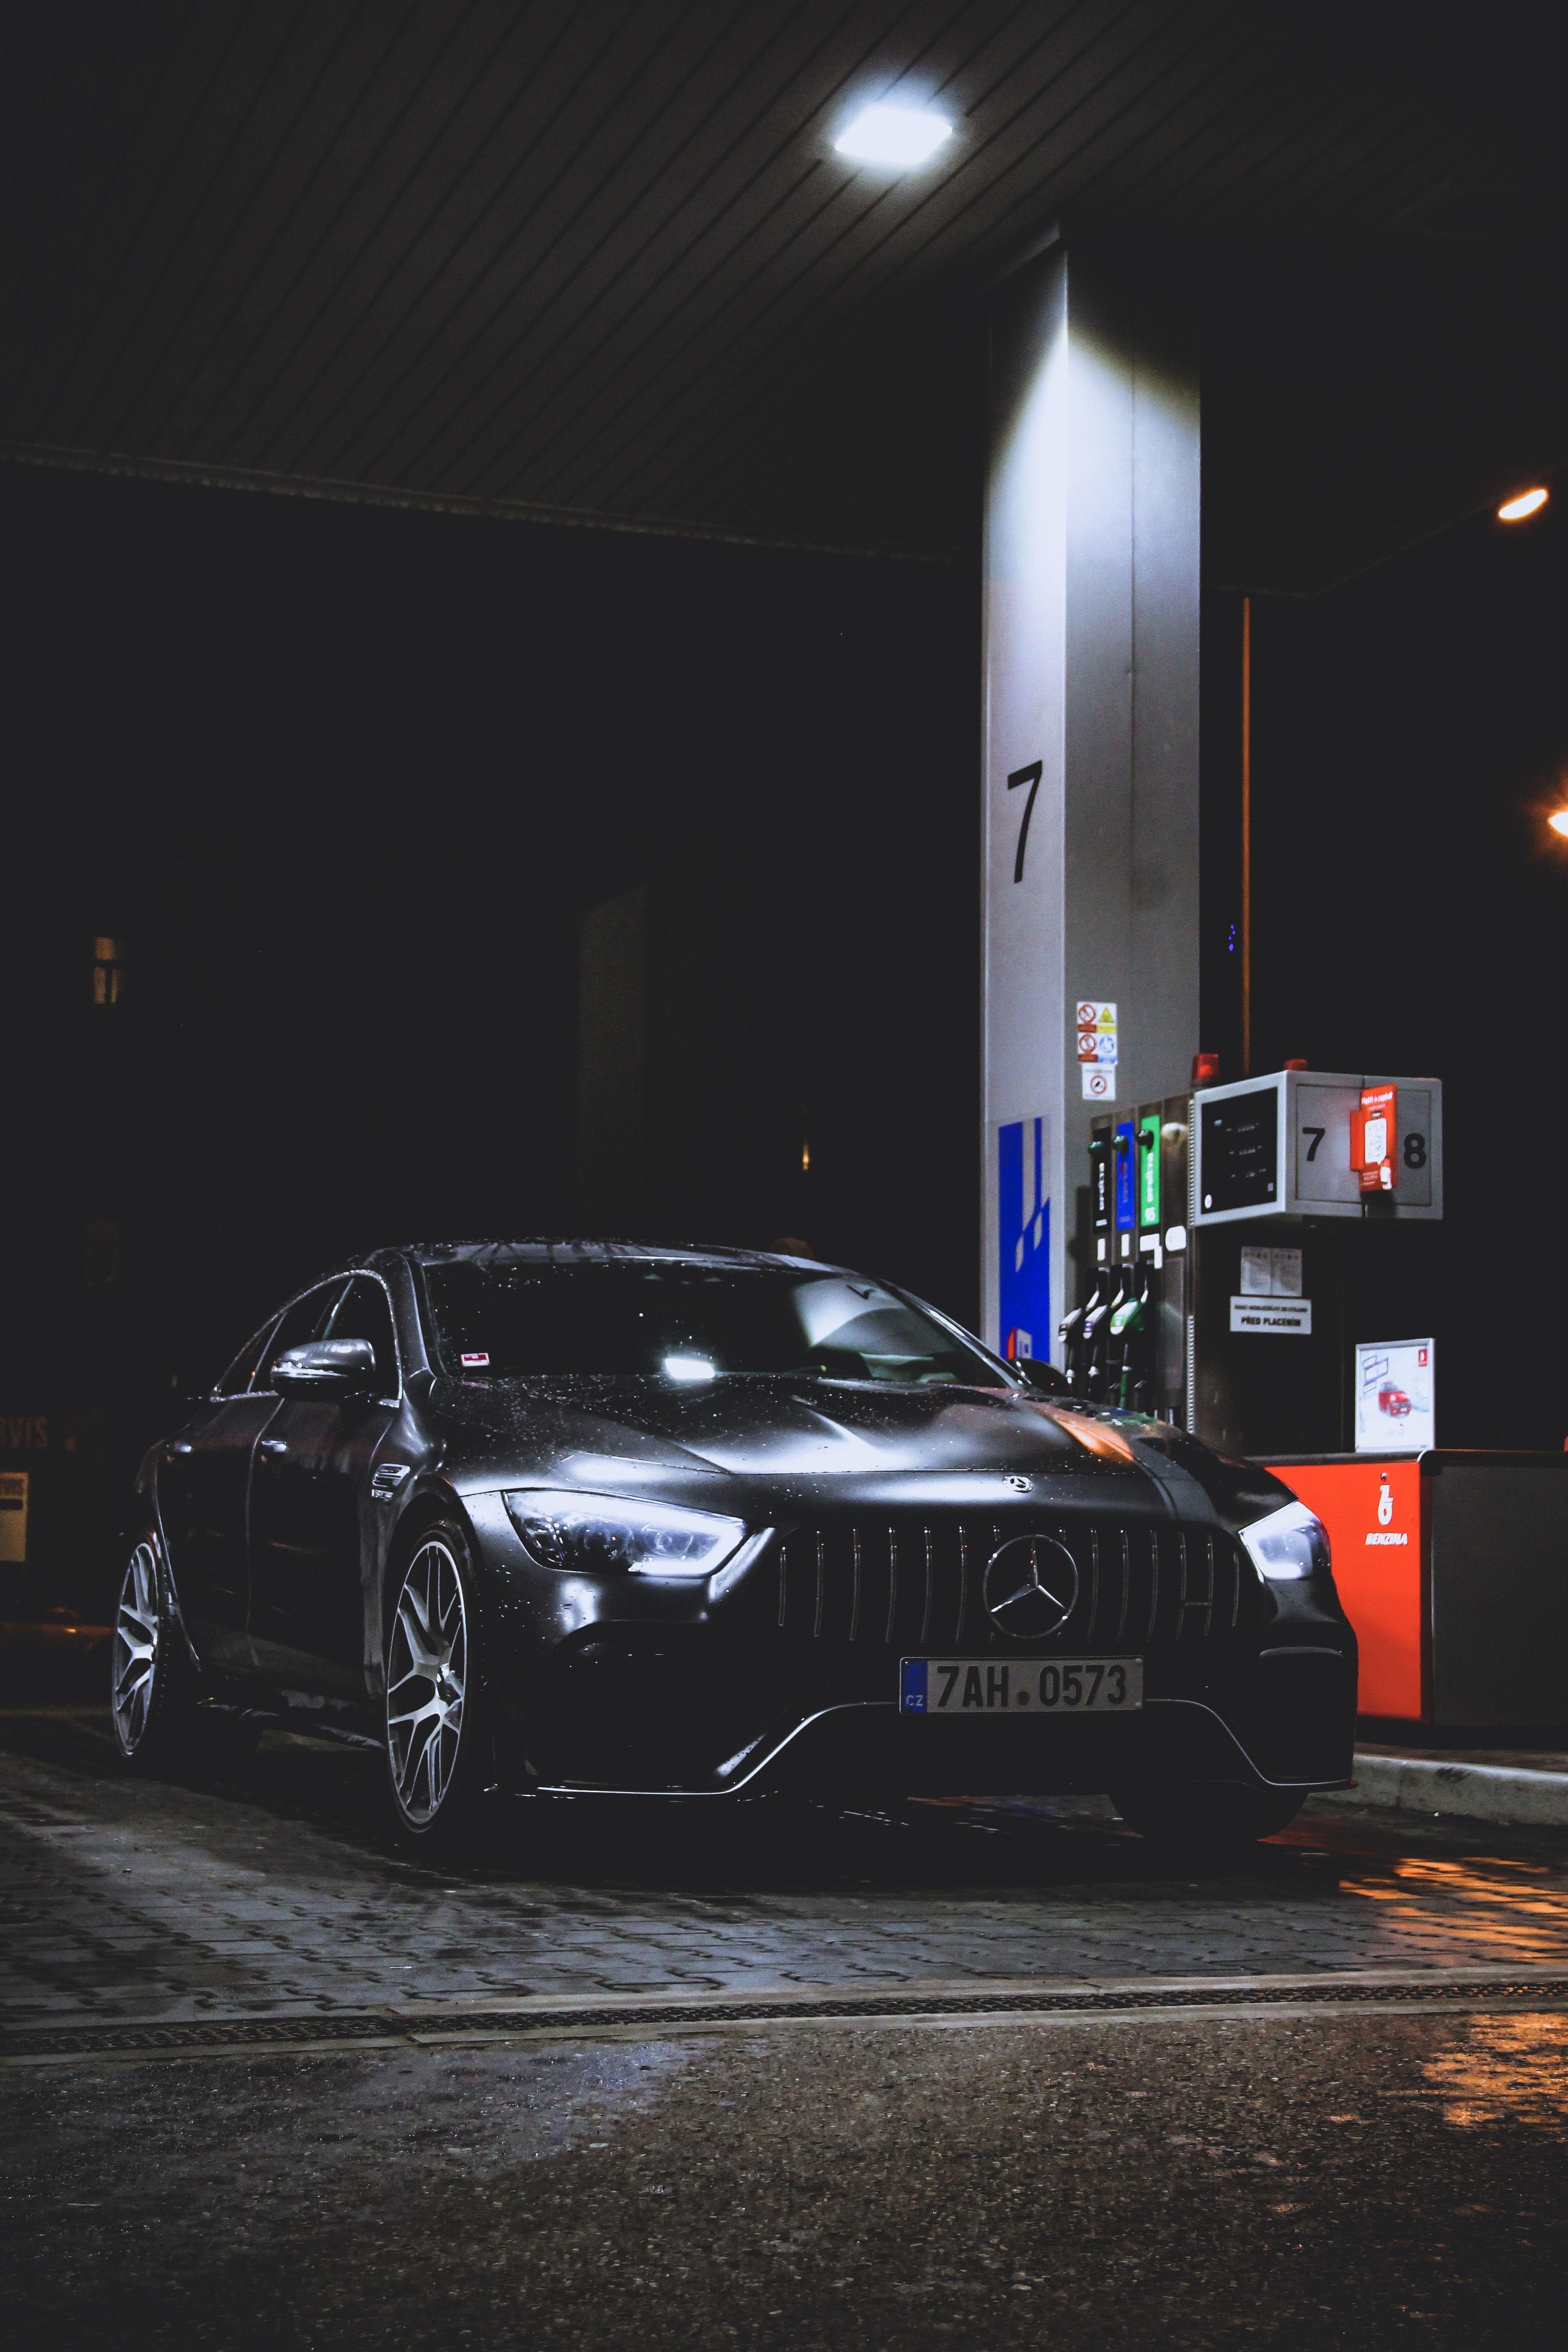 Black Mercedes Benz Car At Gas Station At Night Cars In 2020 Mercedes Benz Wallpaper Black Mercedes Benz Mercedes Benz Cars